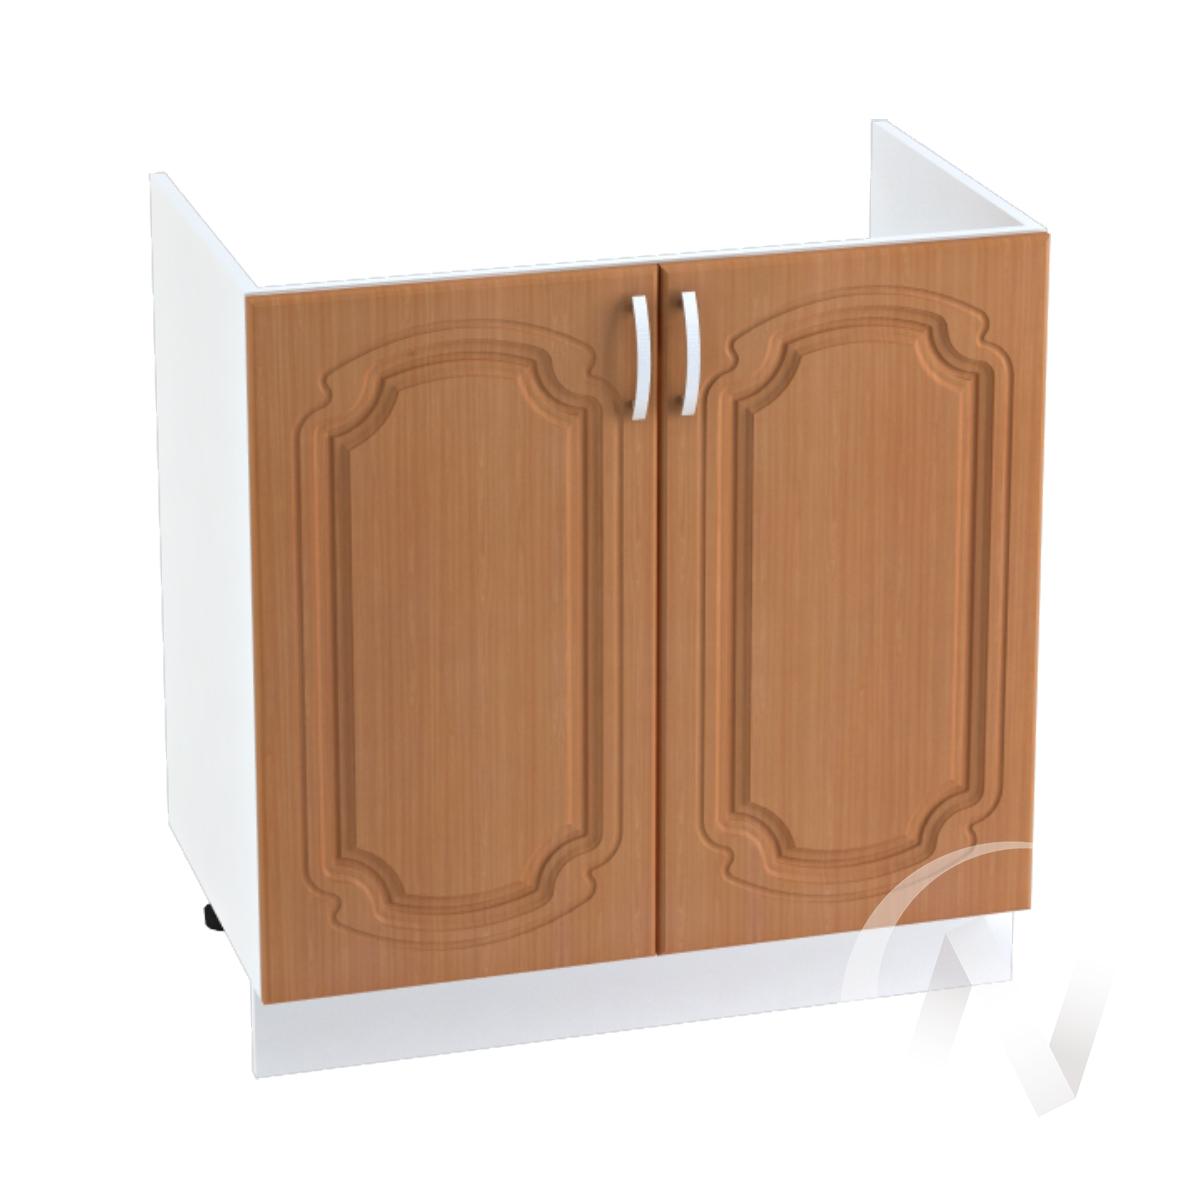 "Кухня ""Настя"": Шкаф нижний под мойку 800, ШНМ 800 (Орех миланский/корпус белый)"